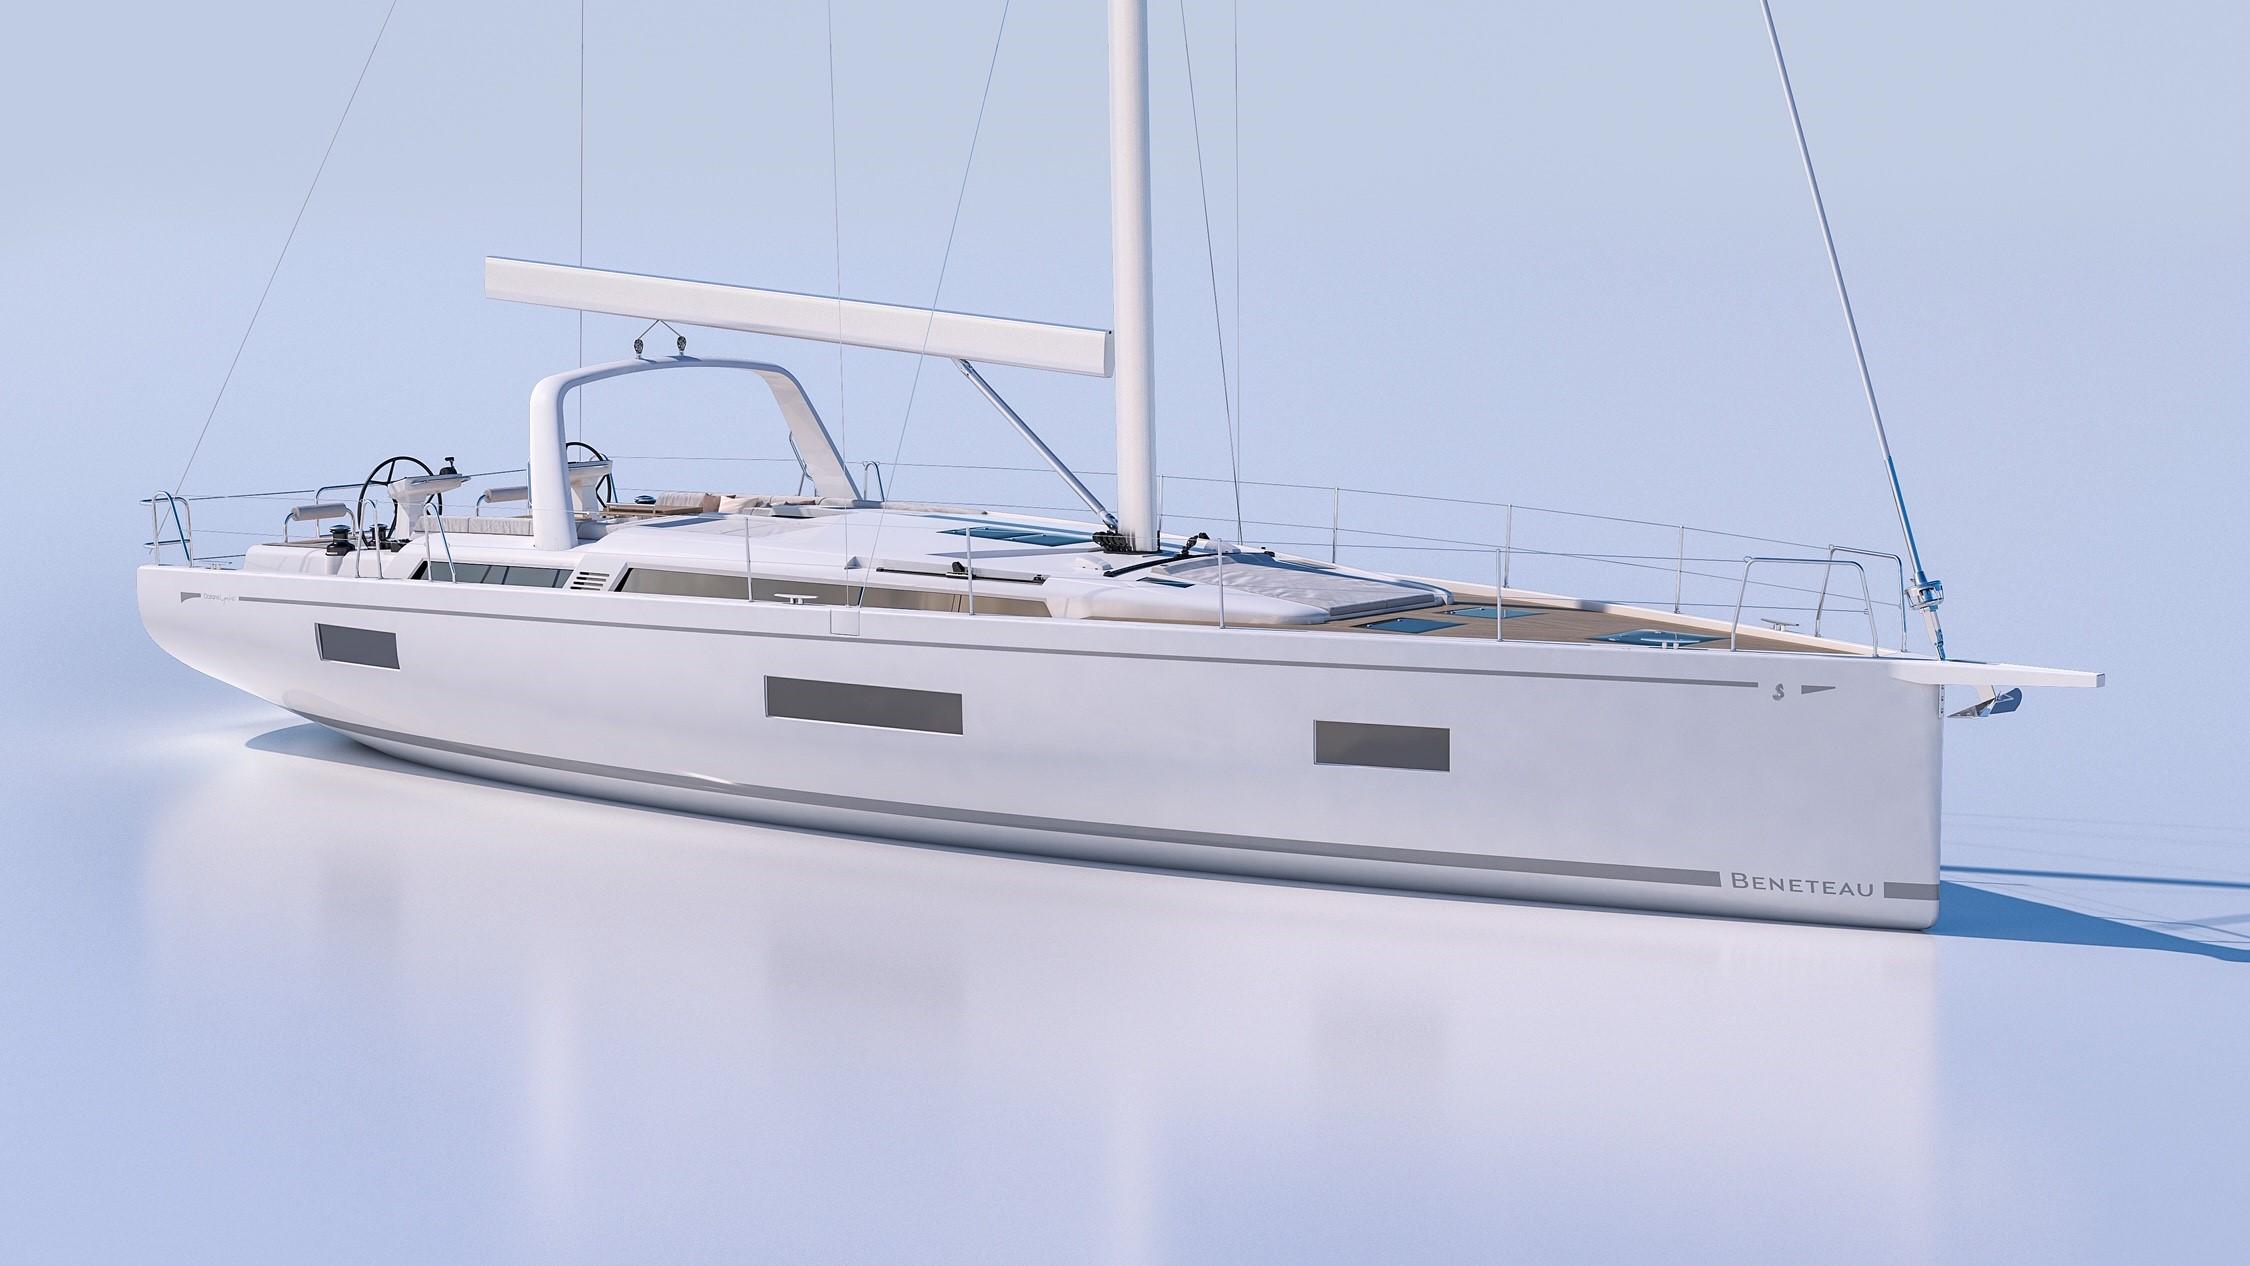 Beneteau Oceanis Yacht 54 Beneteau Oceanis Yacht 54